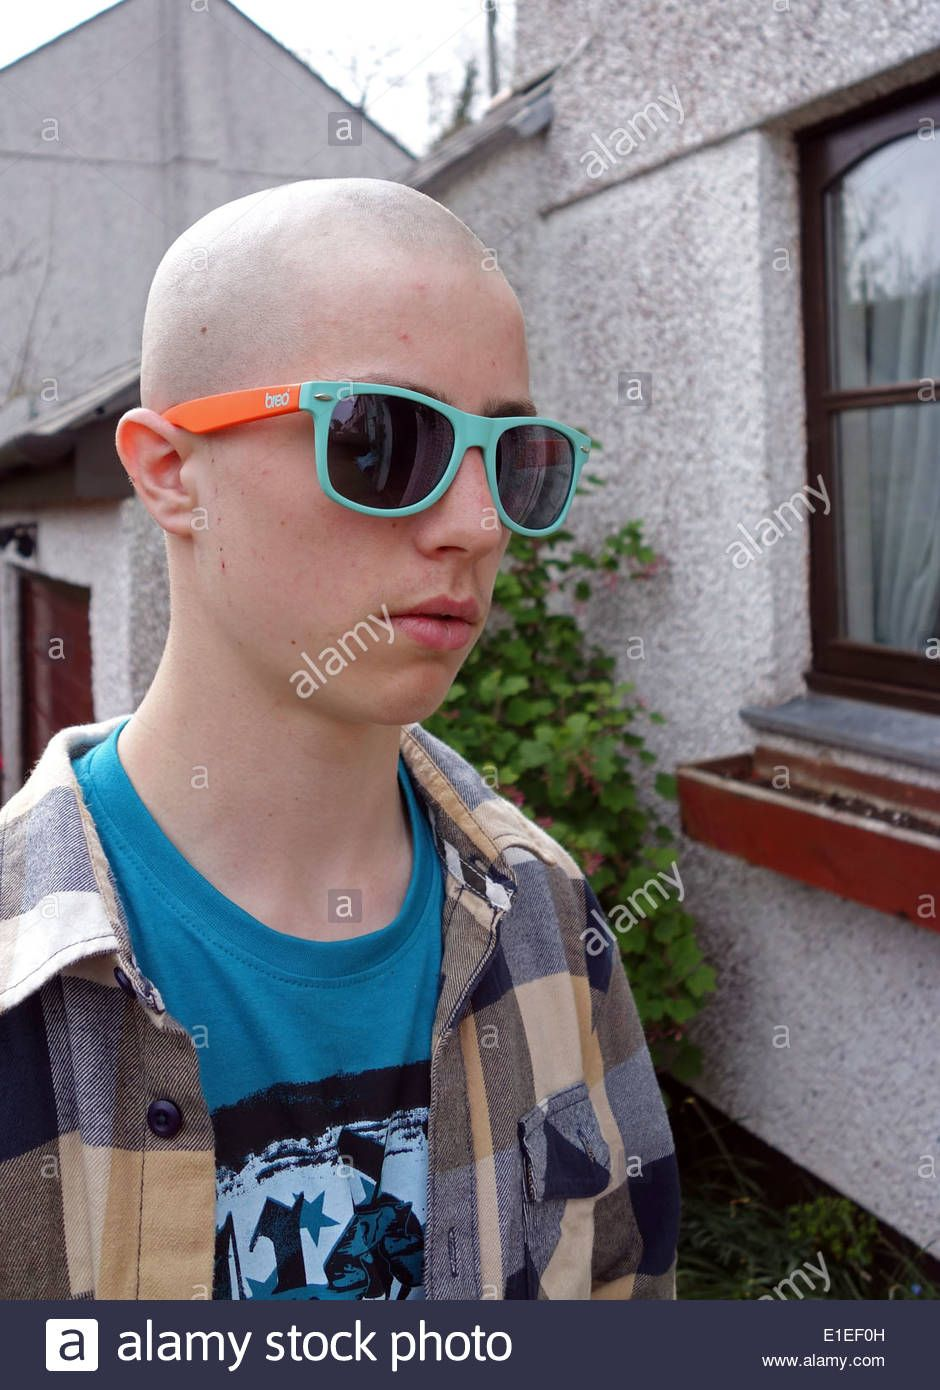 best 25+ skinhead haircut ideas on pinterest | skinhead girl